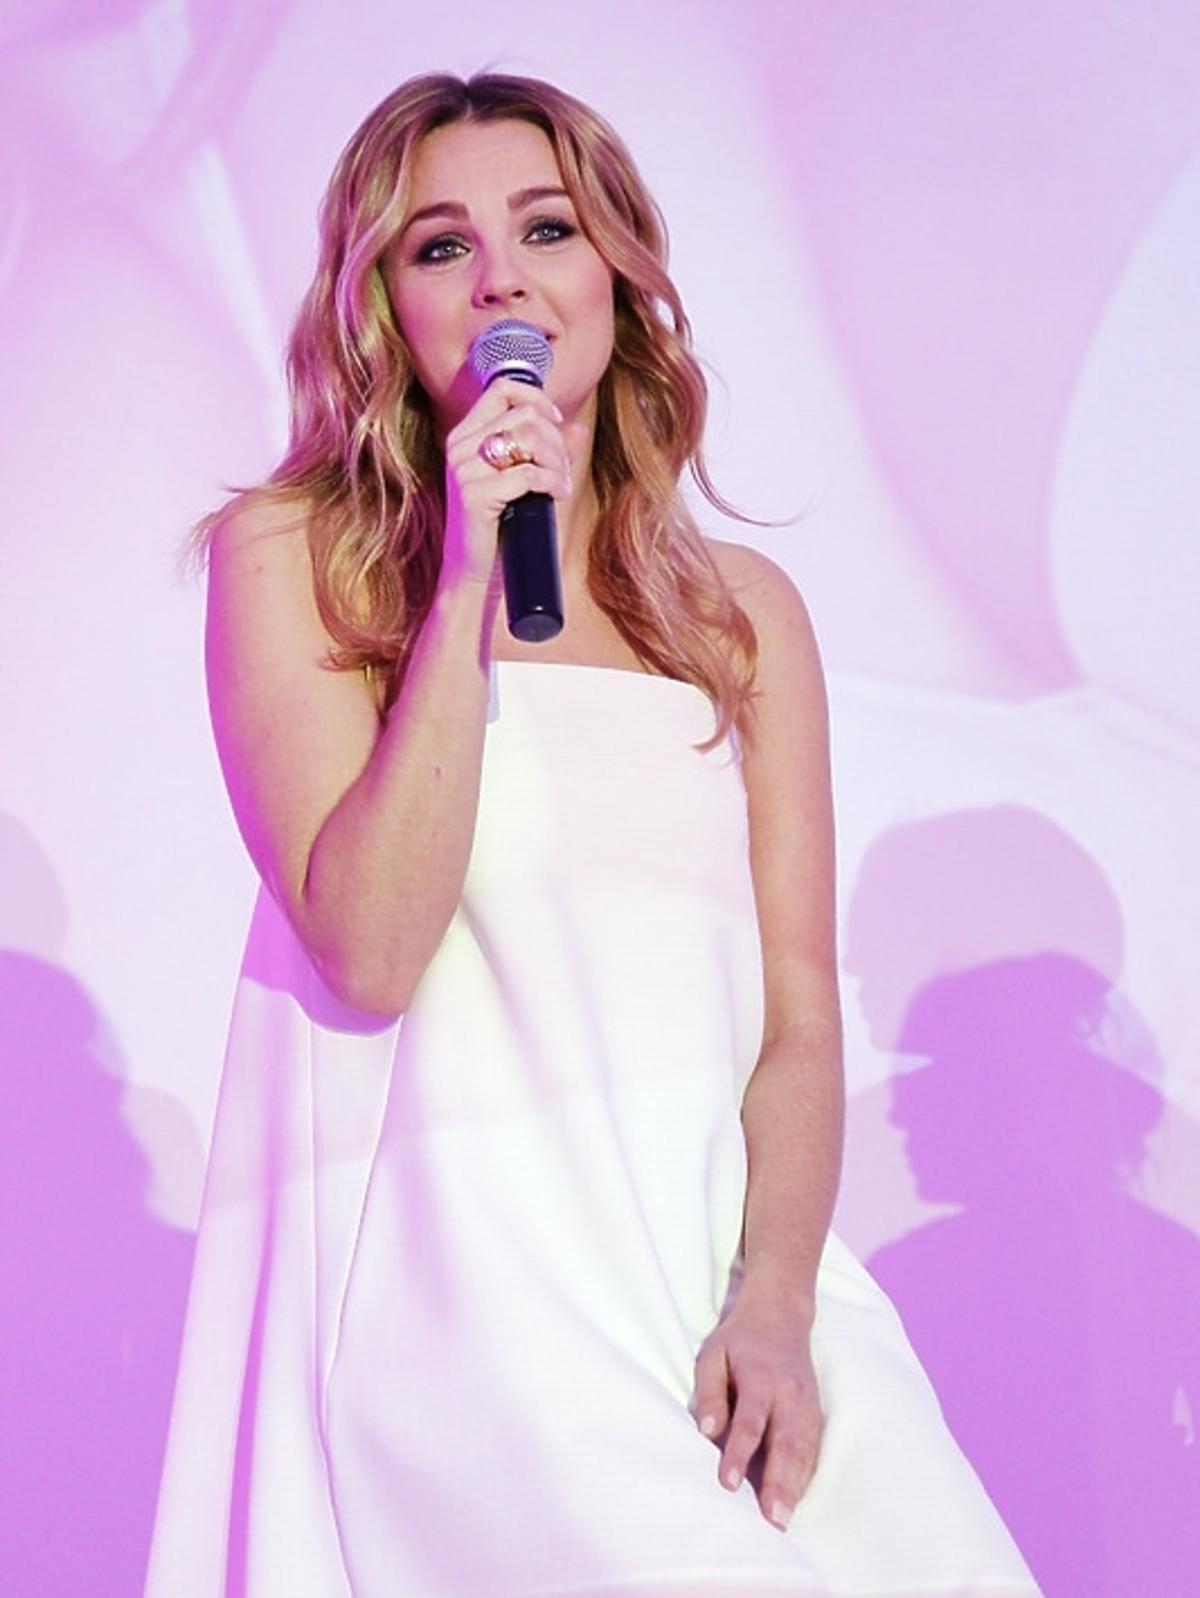 Małgorzata Socha promuje perfumy Avon Sensuelle